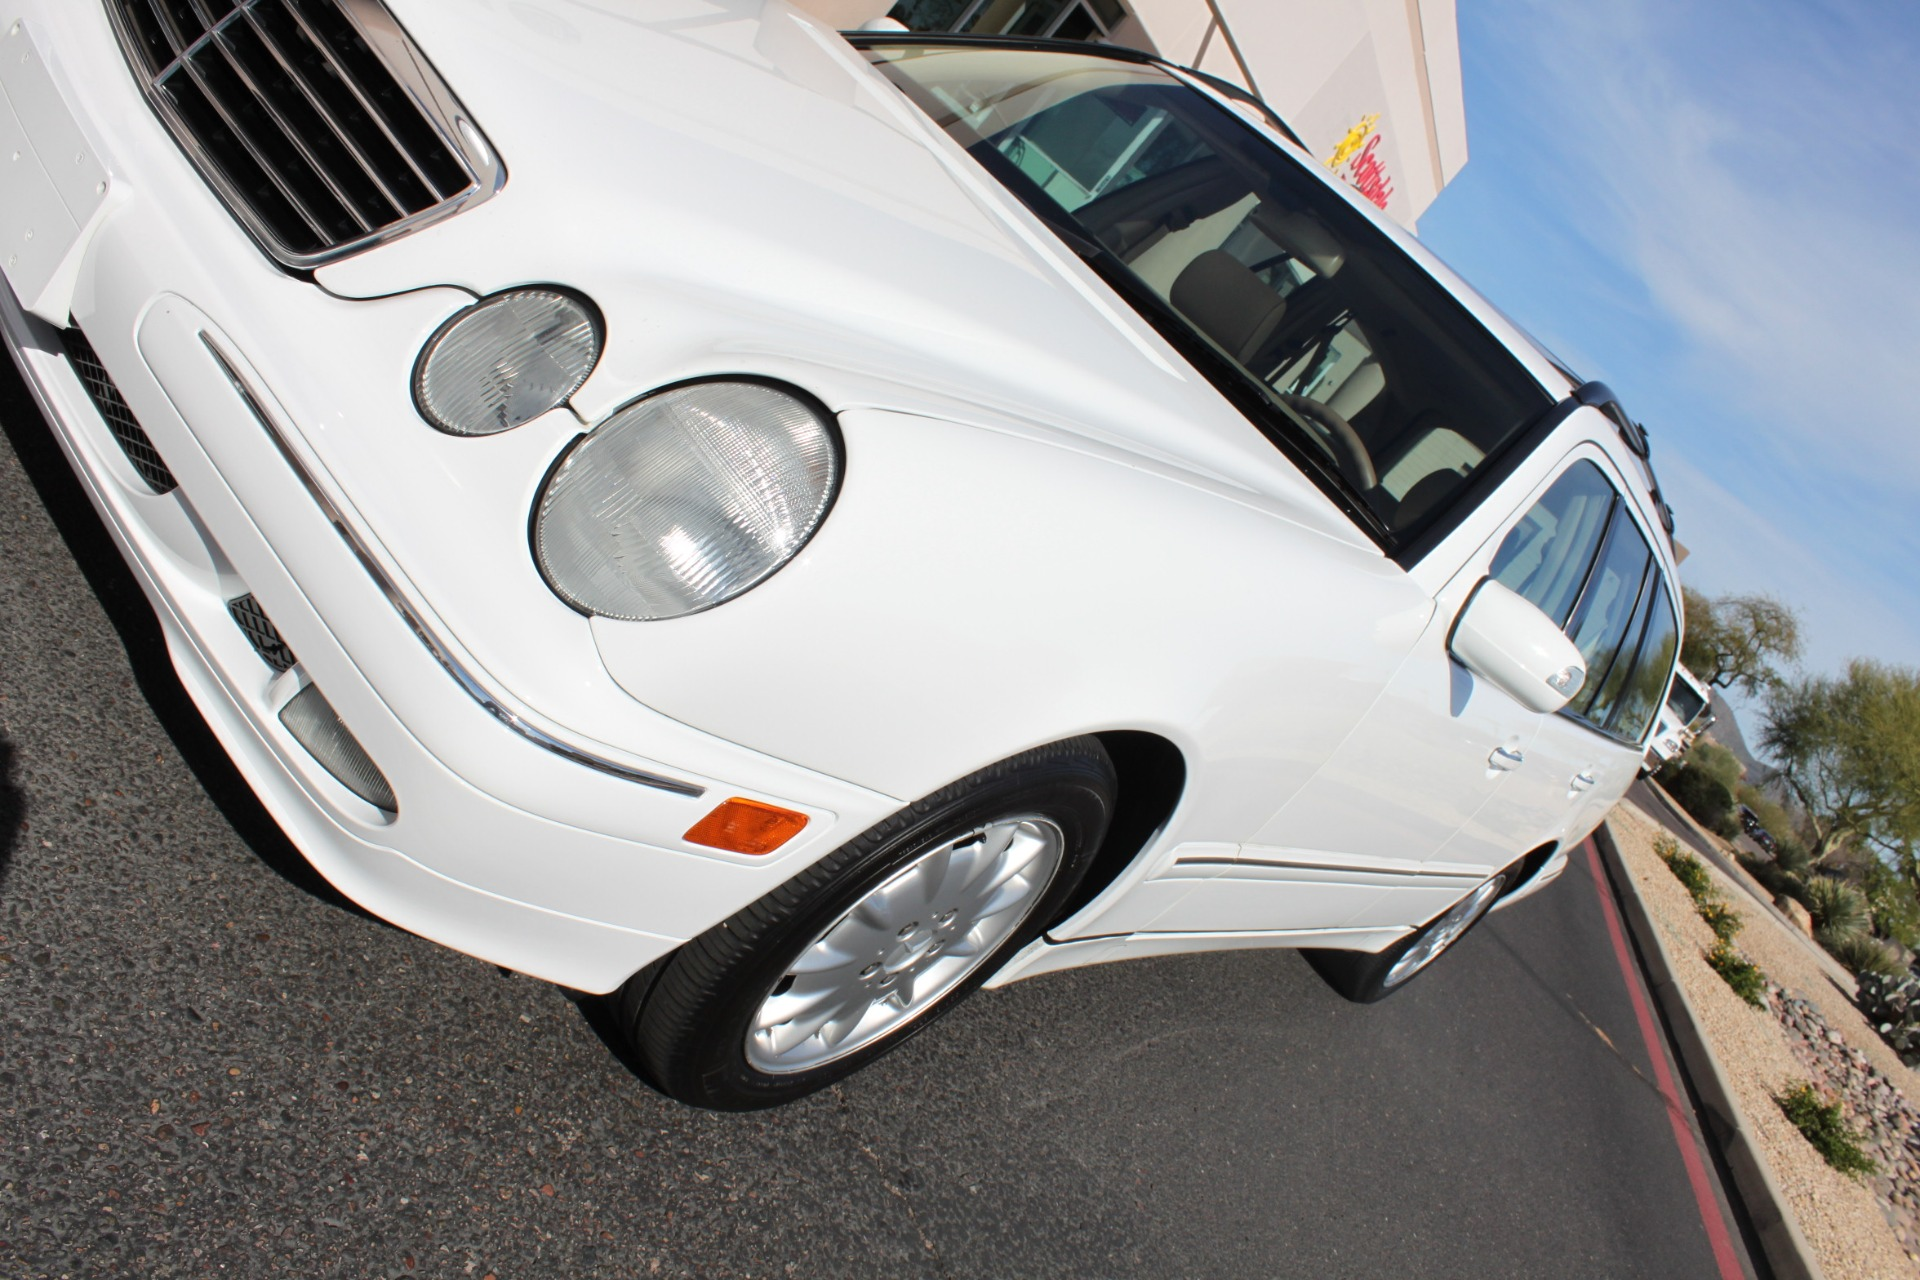 Used-2000-Mercedes-Benz-E-Class-Wagon-Audi